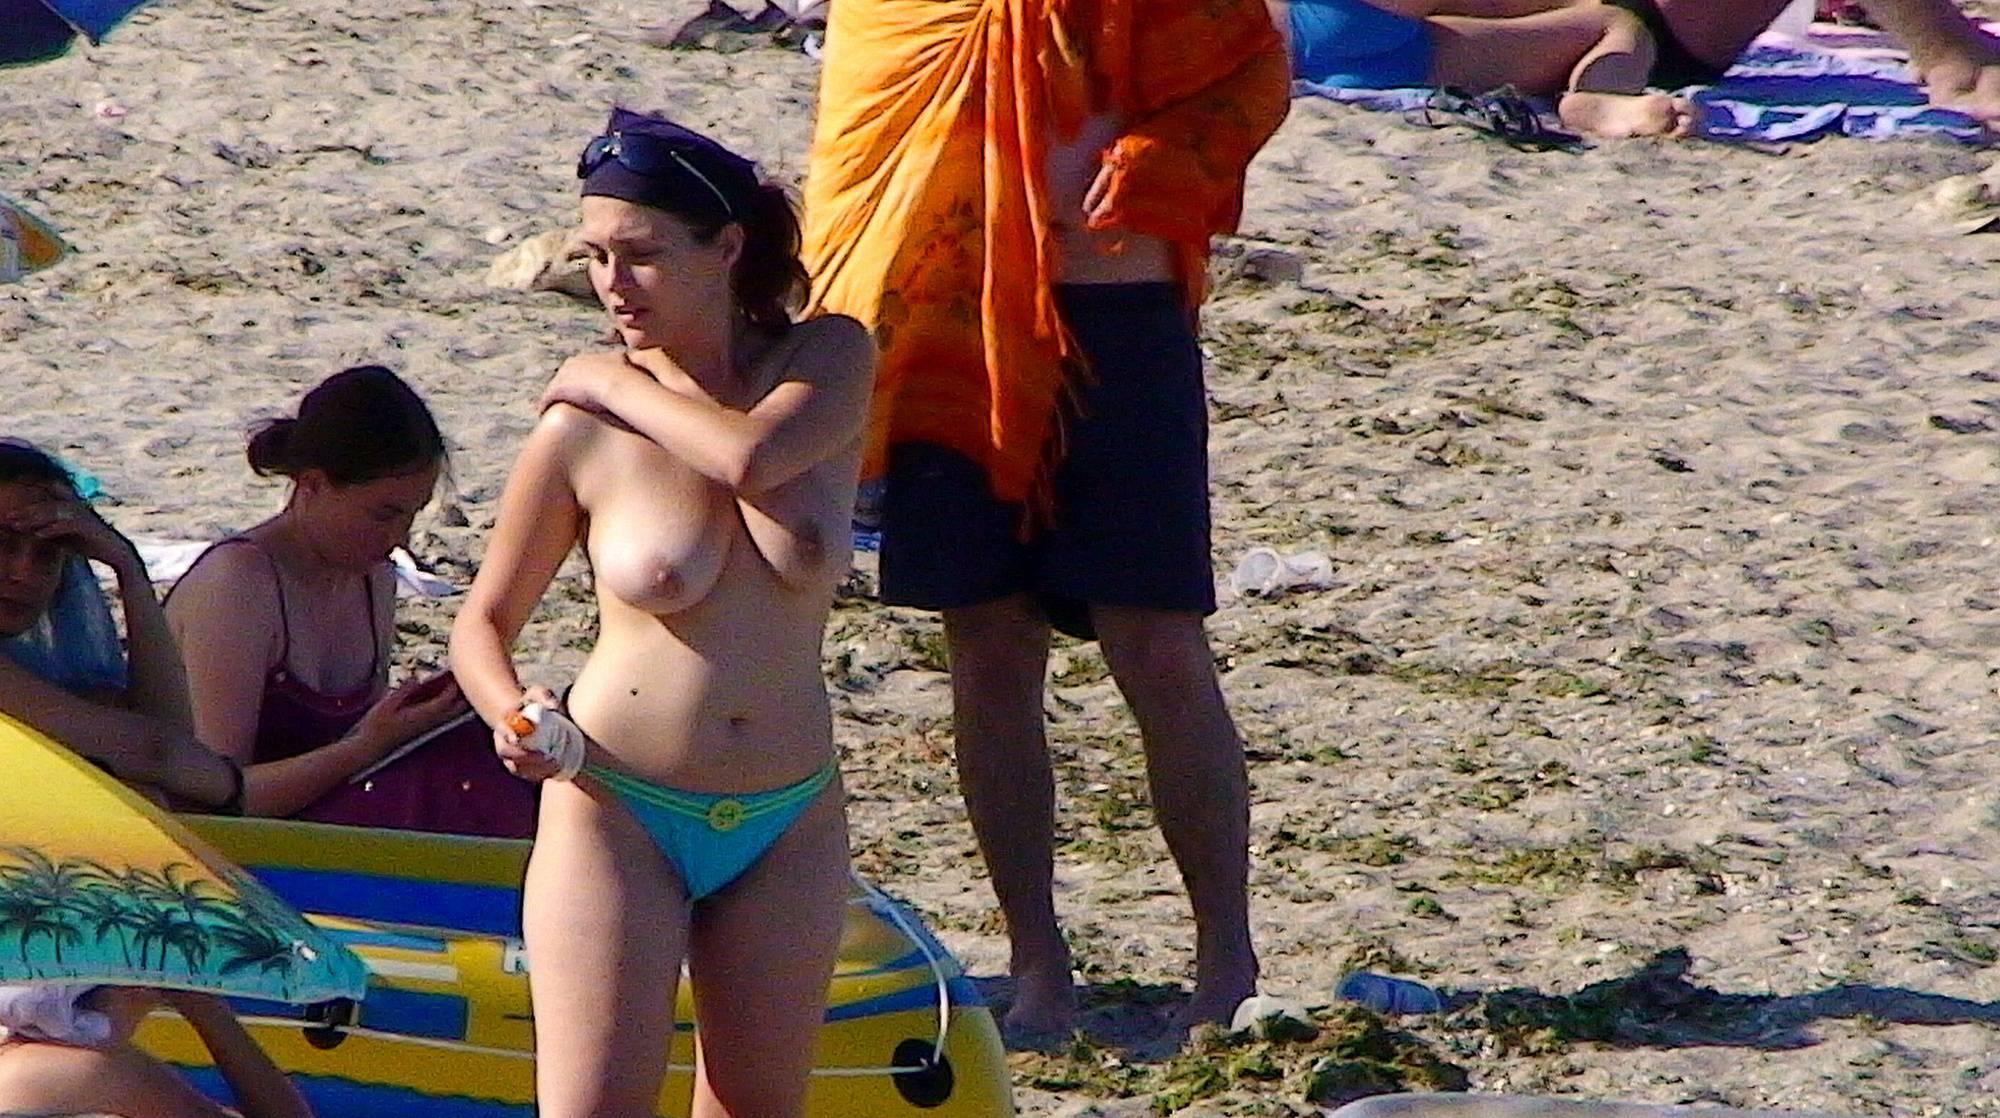 Nudist Photos Romanian Shore Sands WS - 1